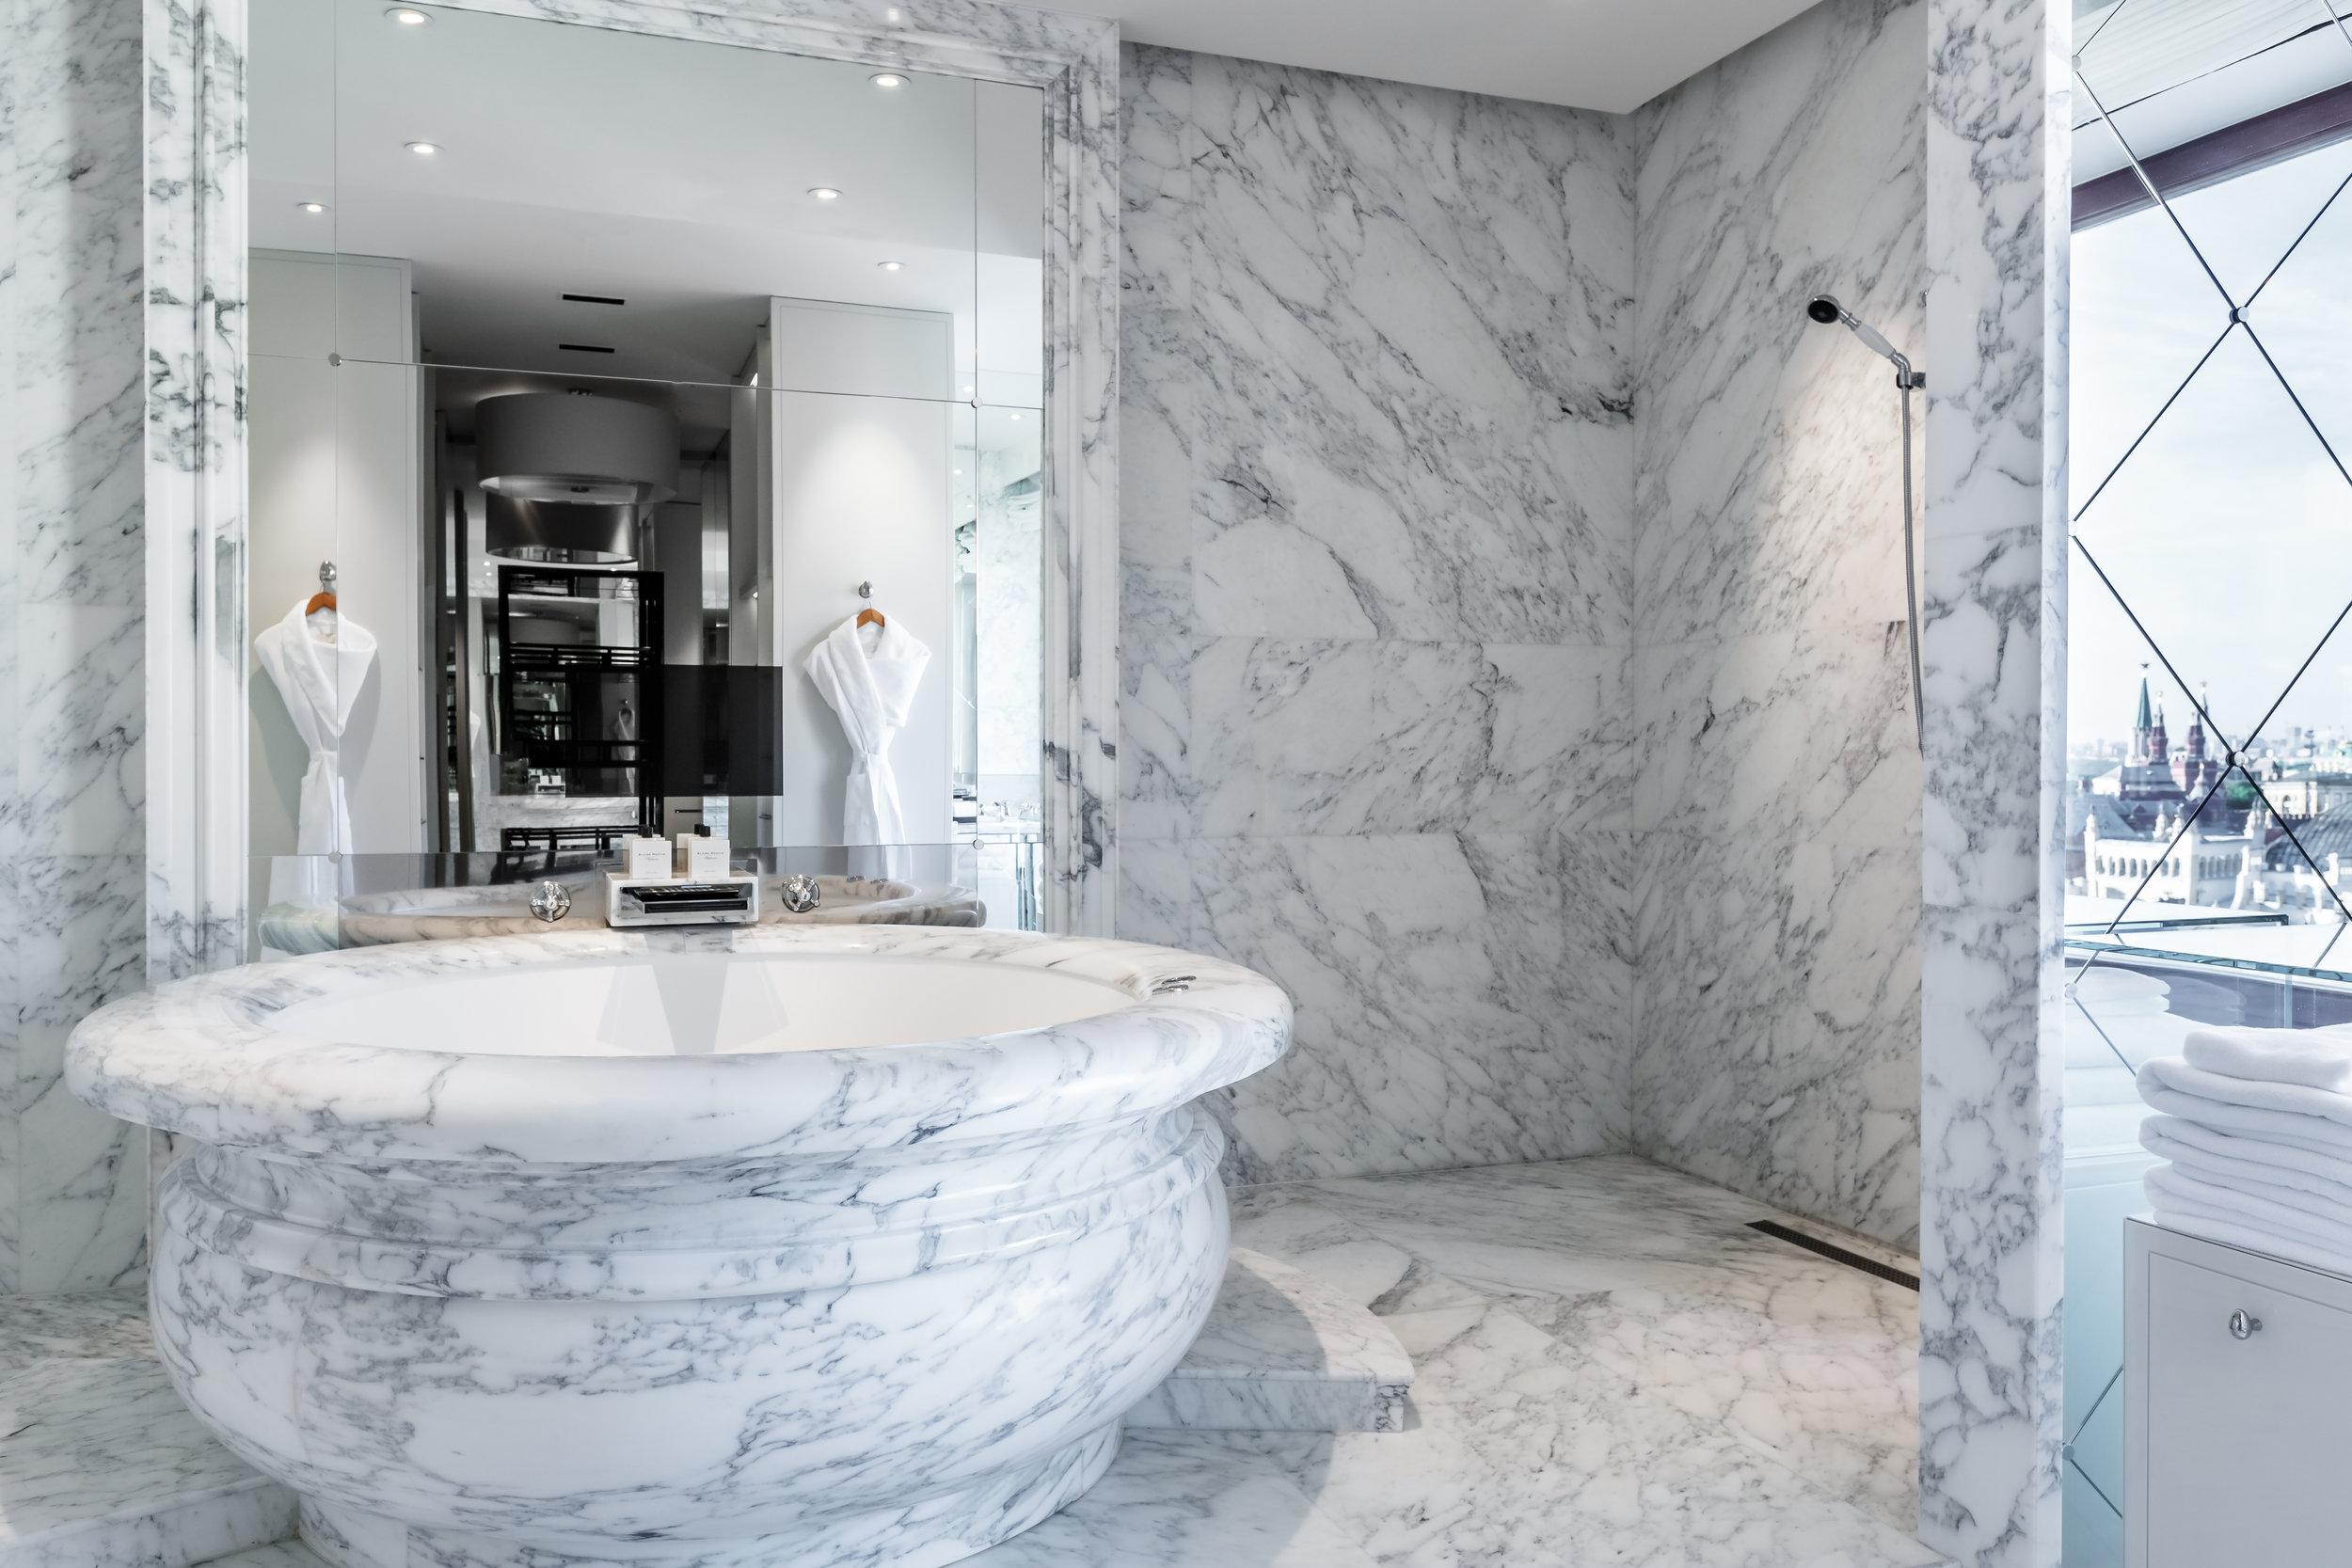 Ararat-Park-Hyatt-Moscow-Penthouse-Suite-Bathroom.jpg